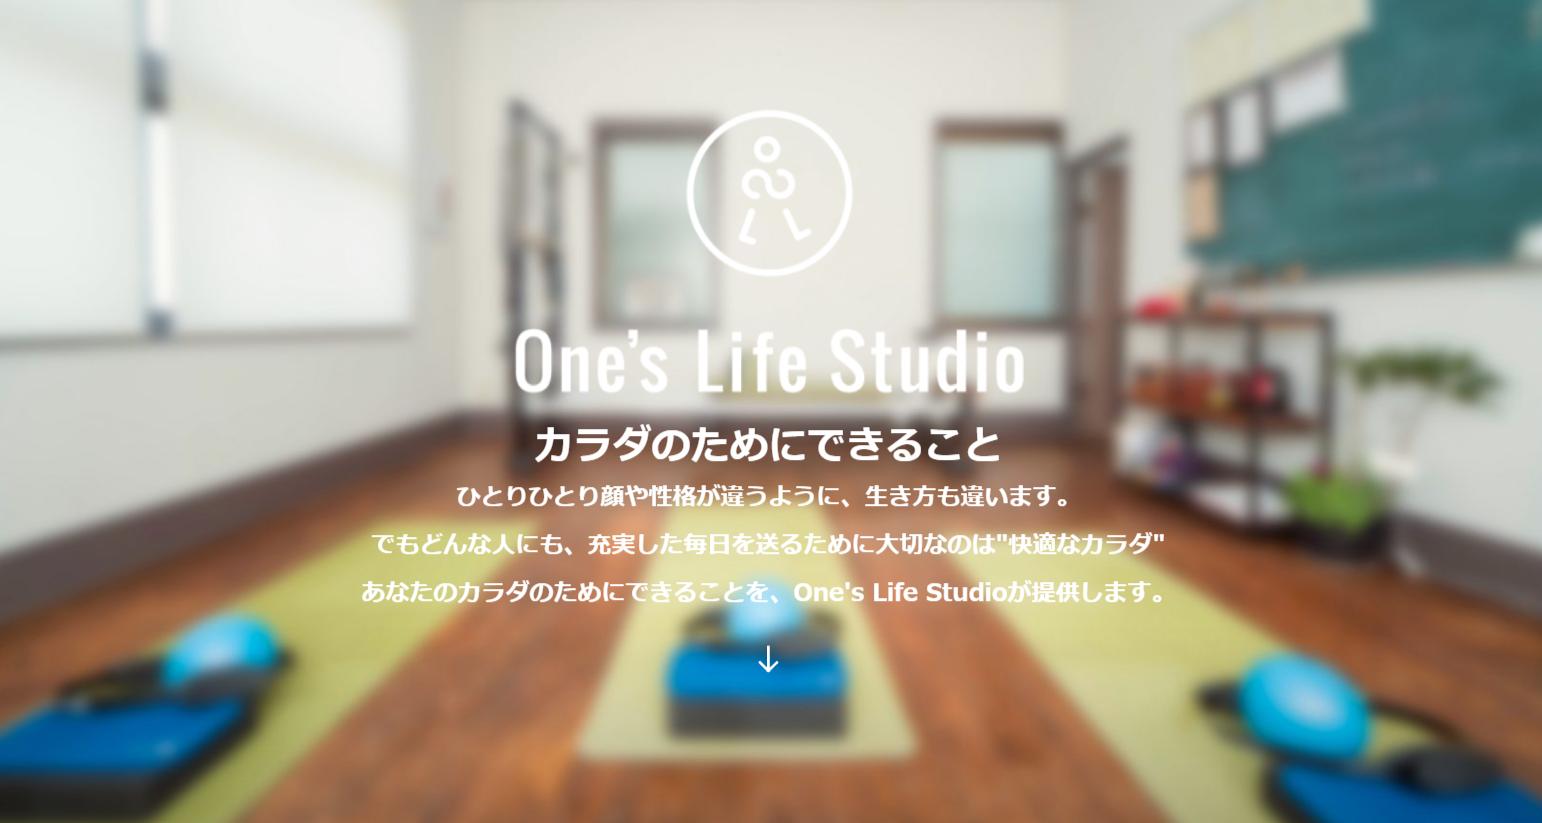 One's Life Studio (ワンズライフスタジオ)